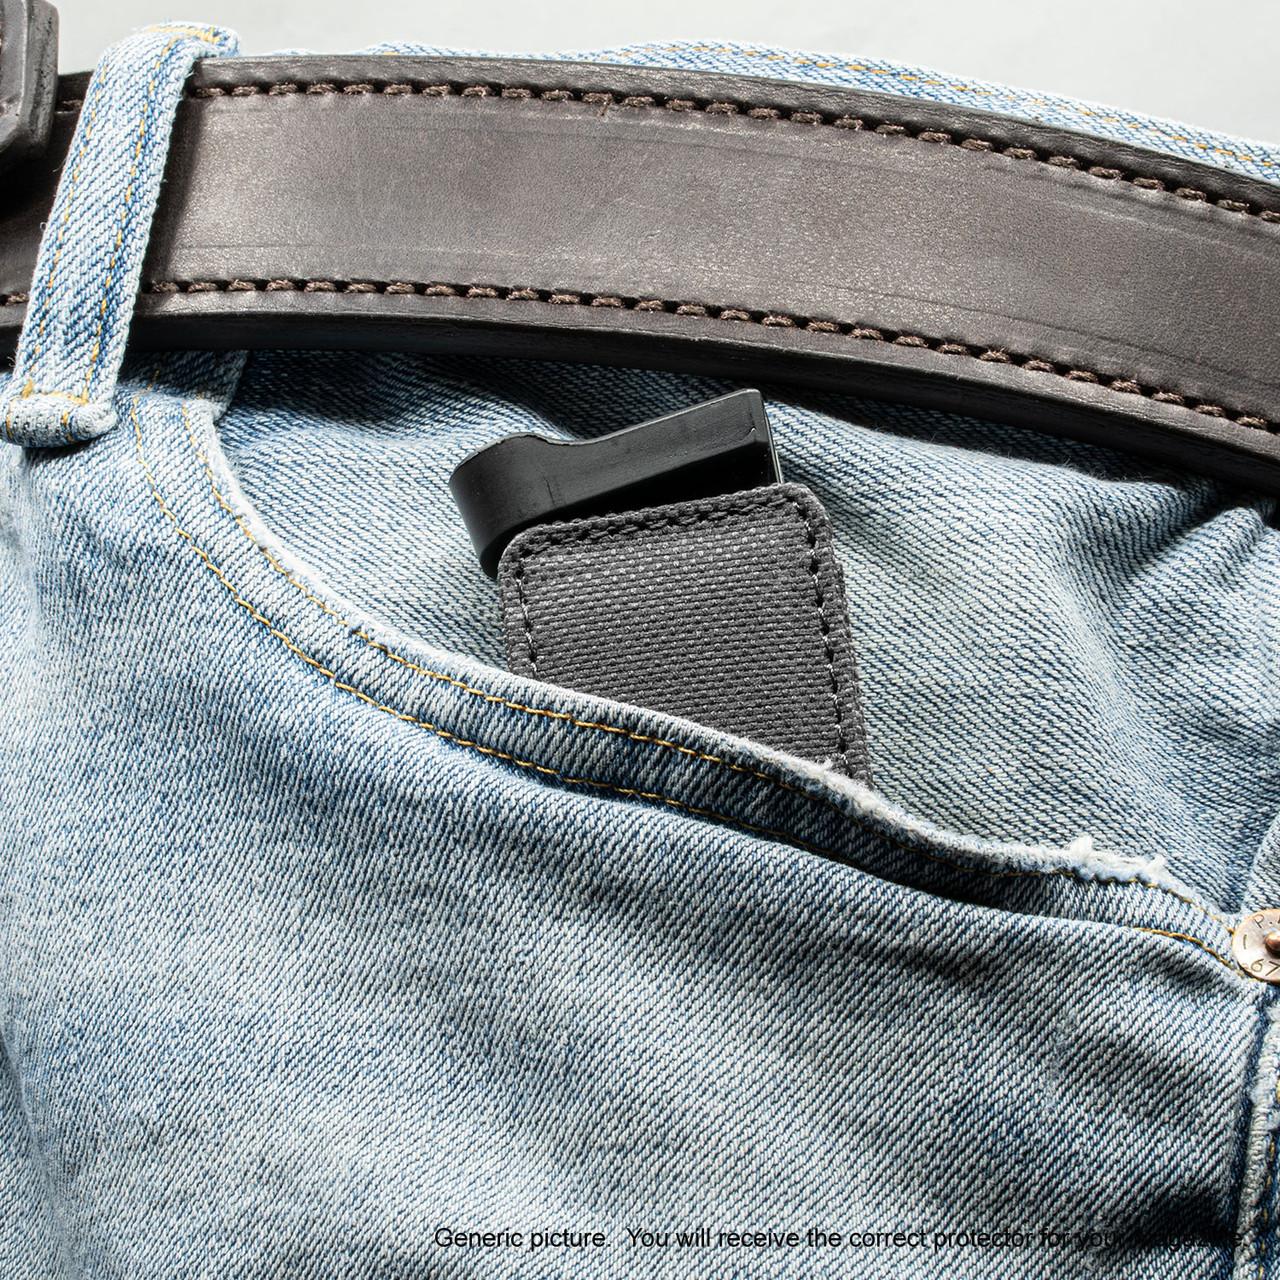 Beretta APX Grey Covert Magazine Pocket Protector